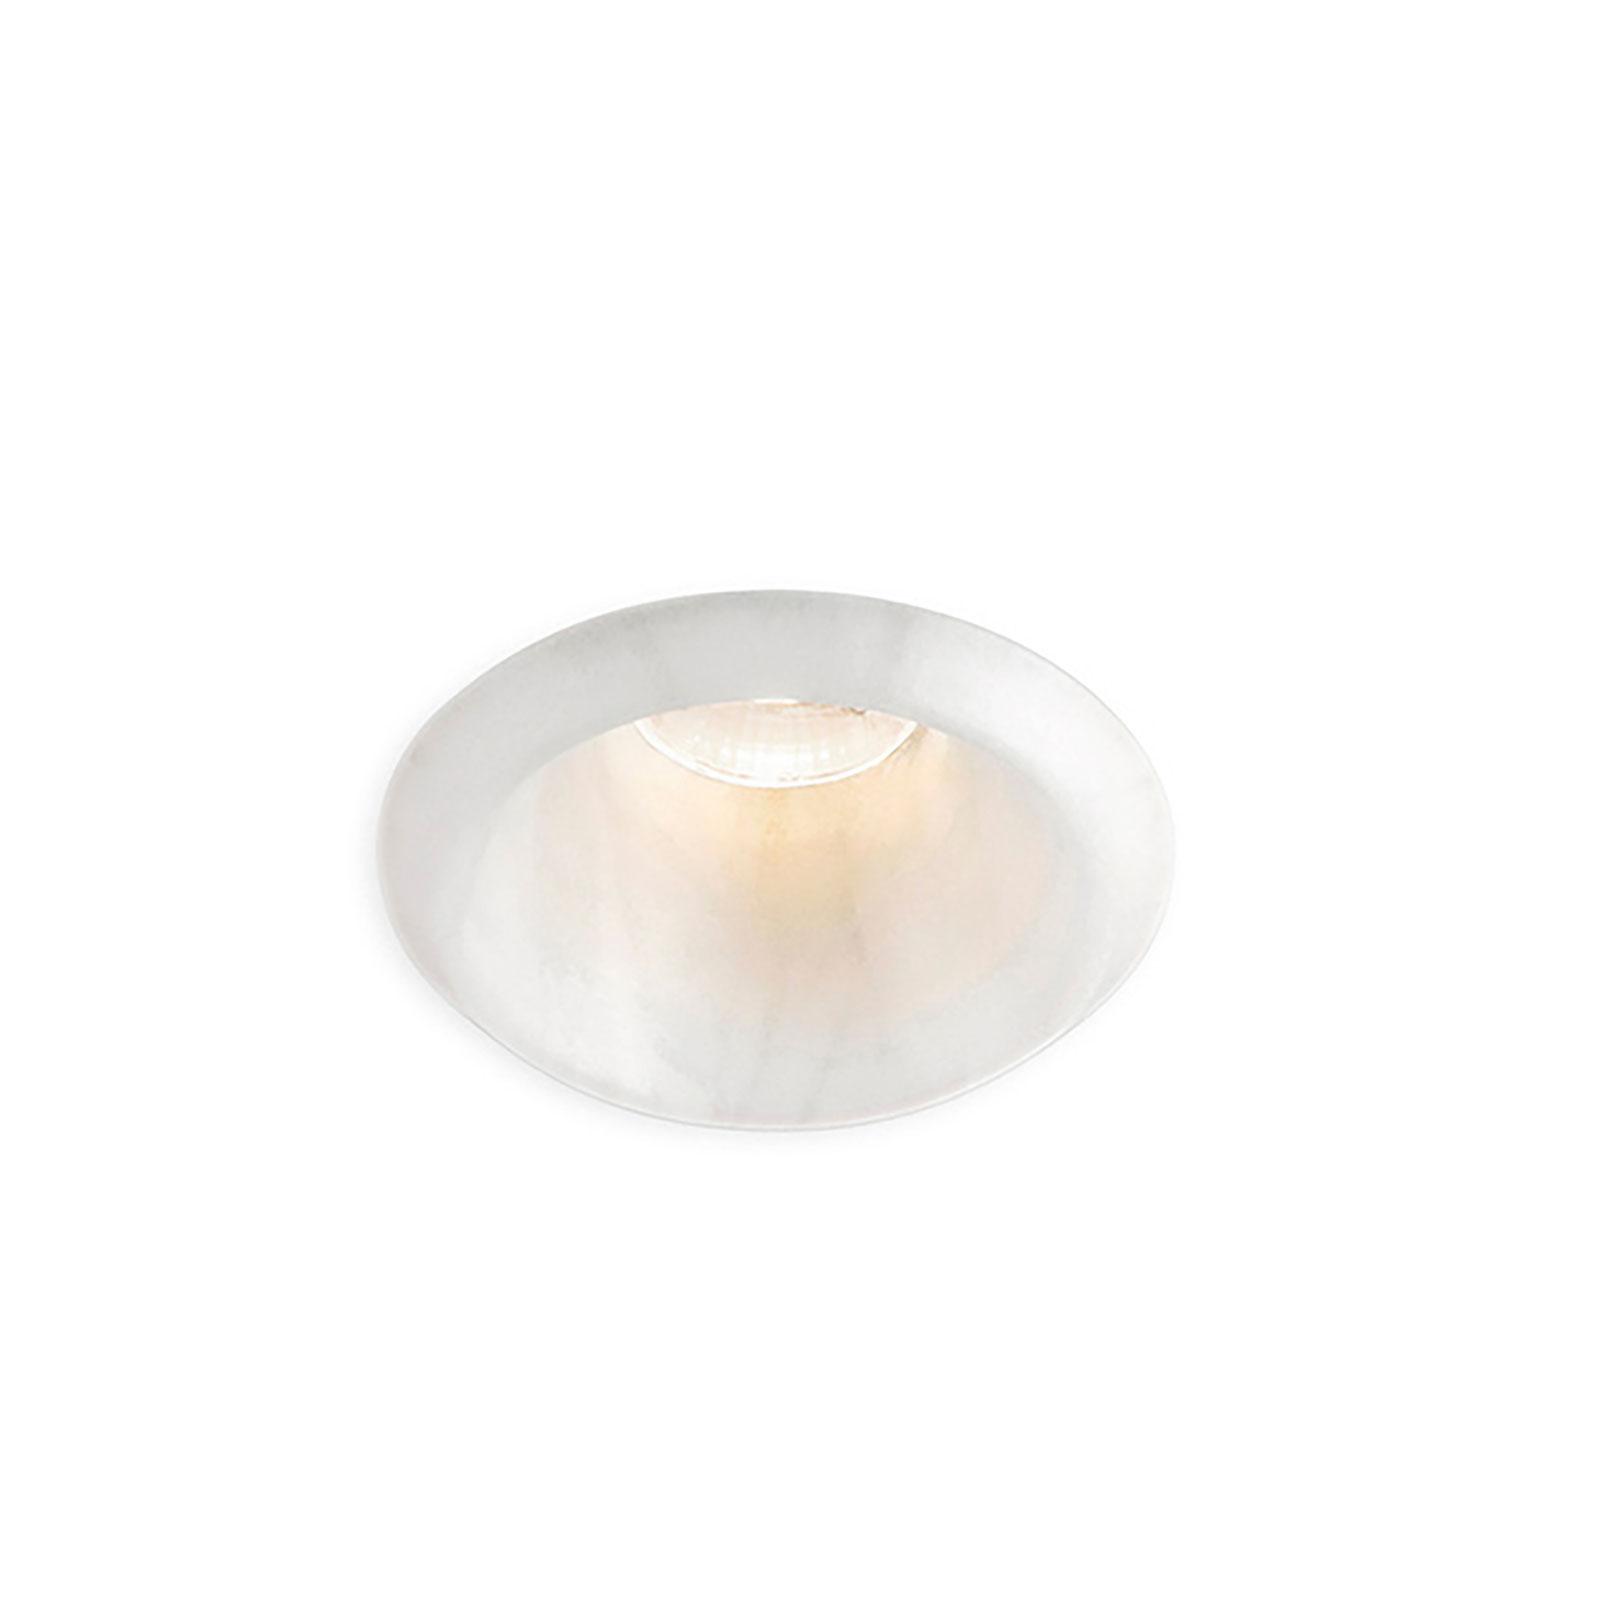 LEDS-C4 Play Raw downlight alabaster 927 6,4W 30°